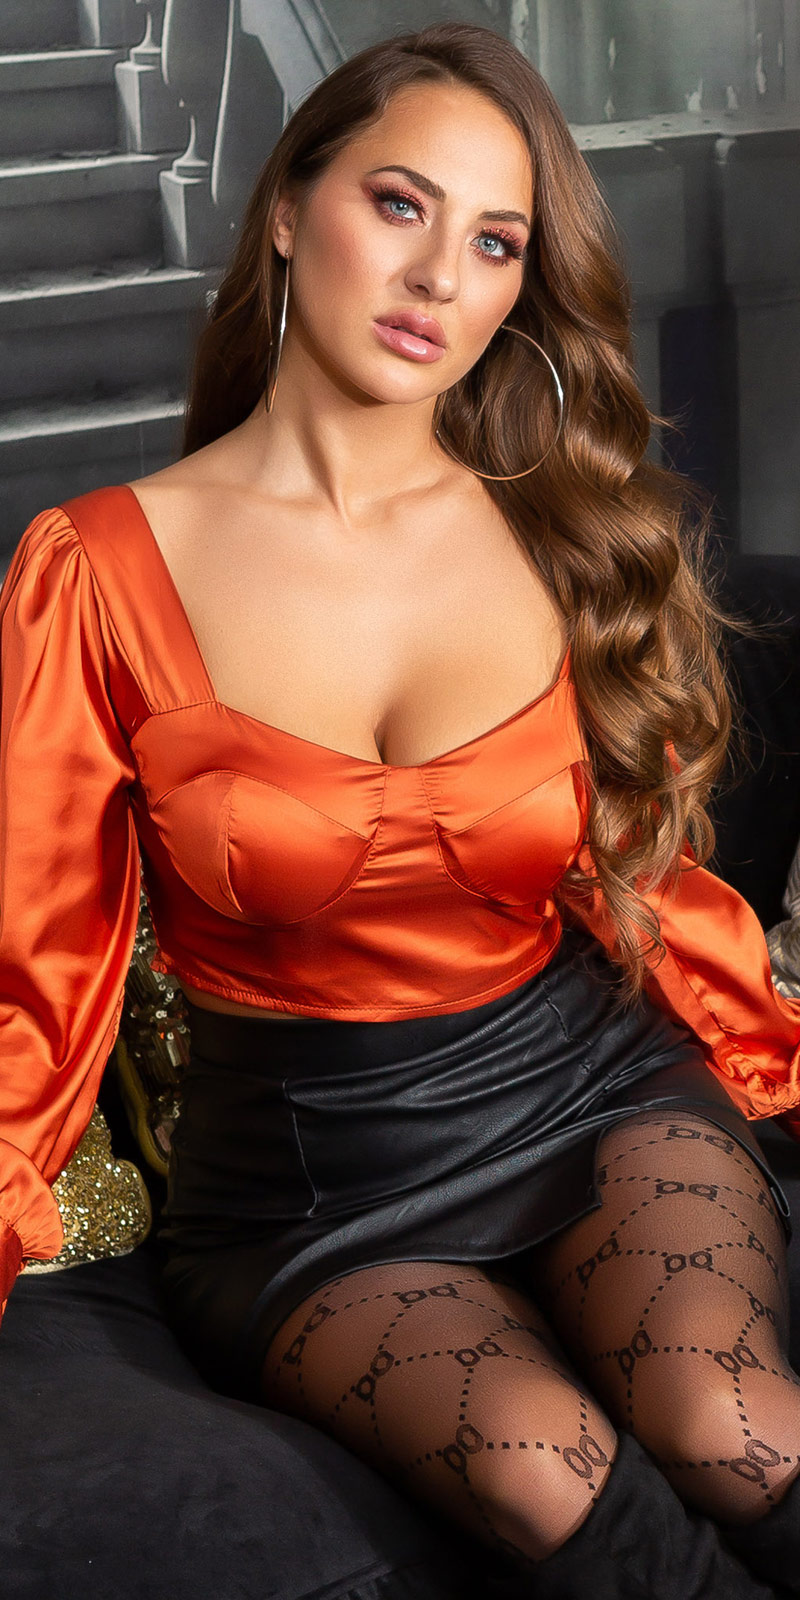 Topuri cu buricul gol sexy Satin-Look